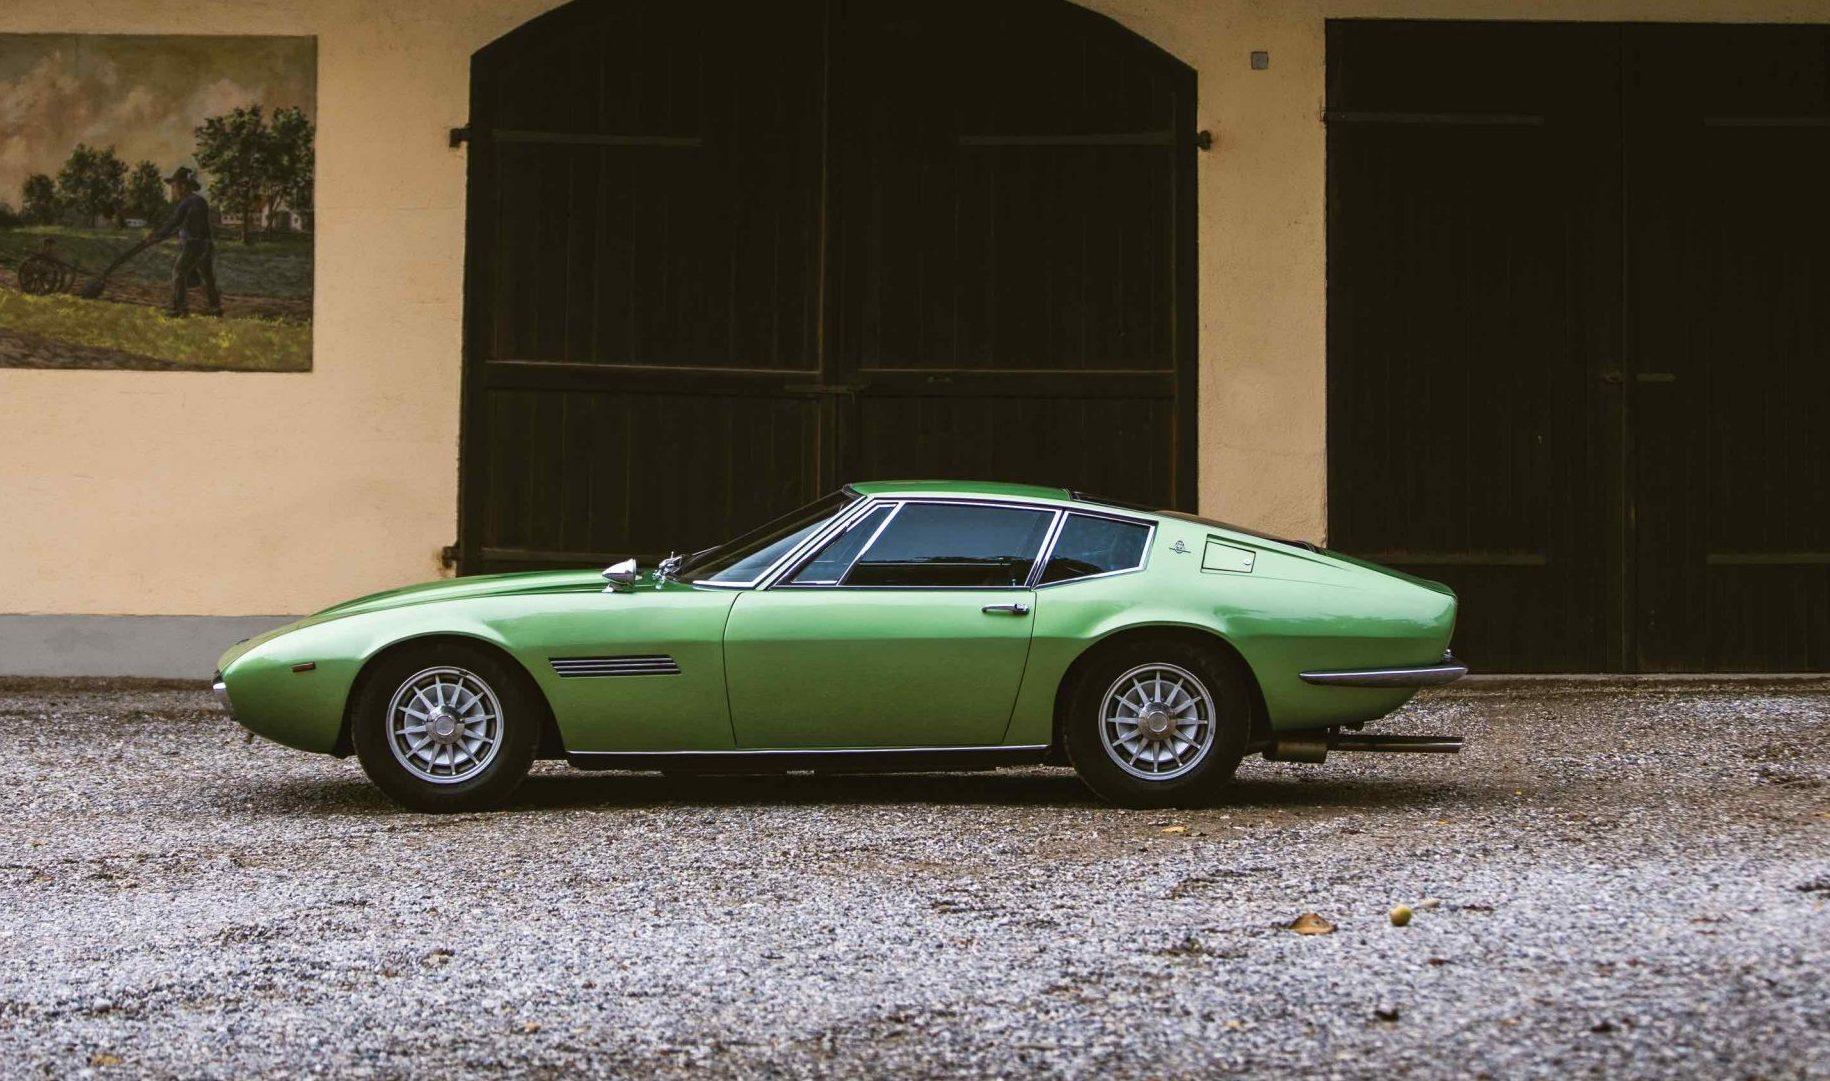 Maserati-Ghibli side profile